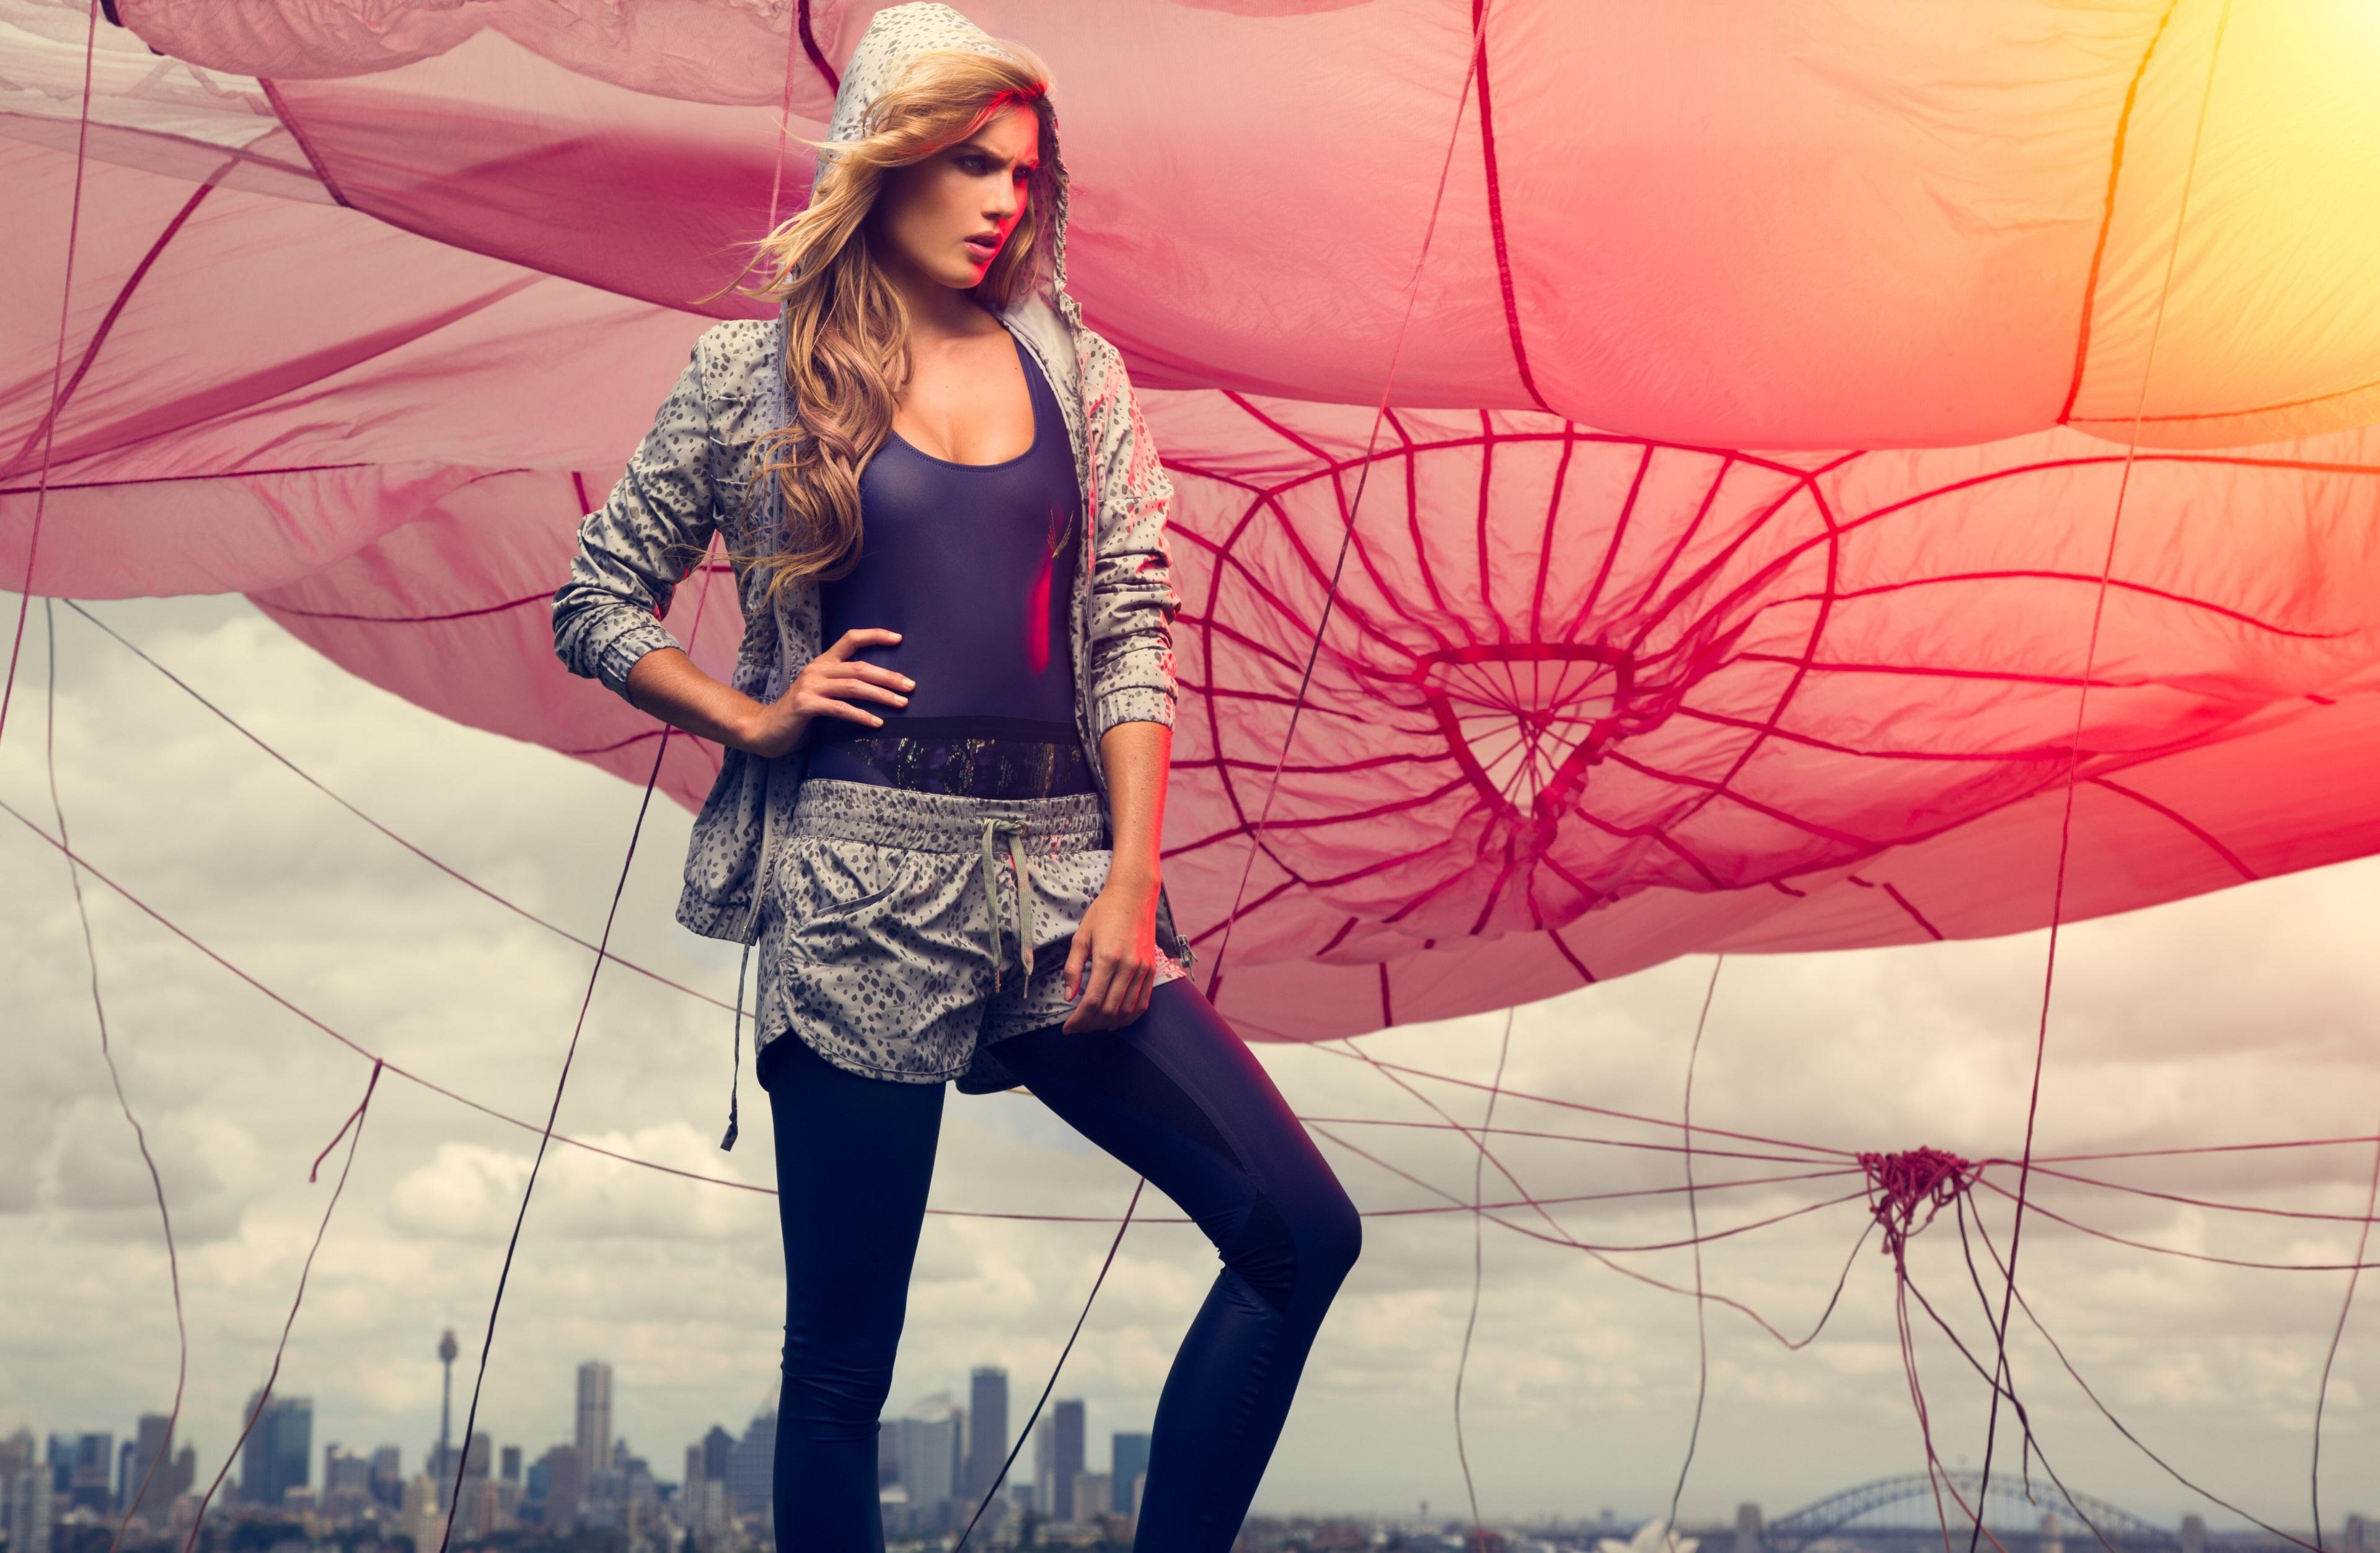 Sport Girl 4k Wallpaper: Girl Wearing Sports Clothes, HD Girls, 4k Wallpapers